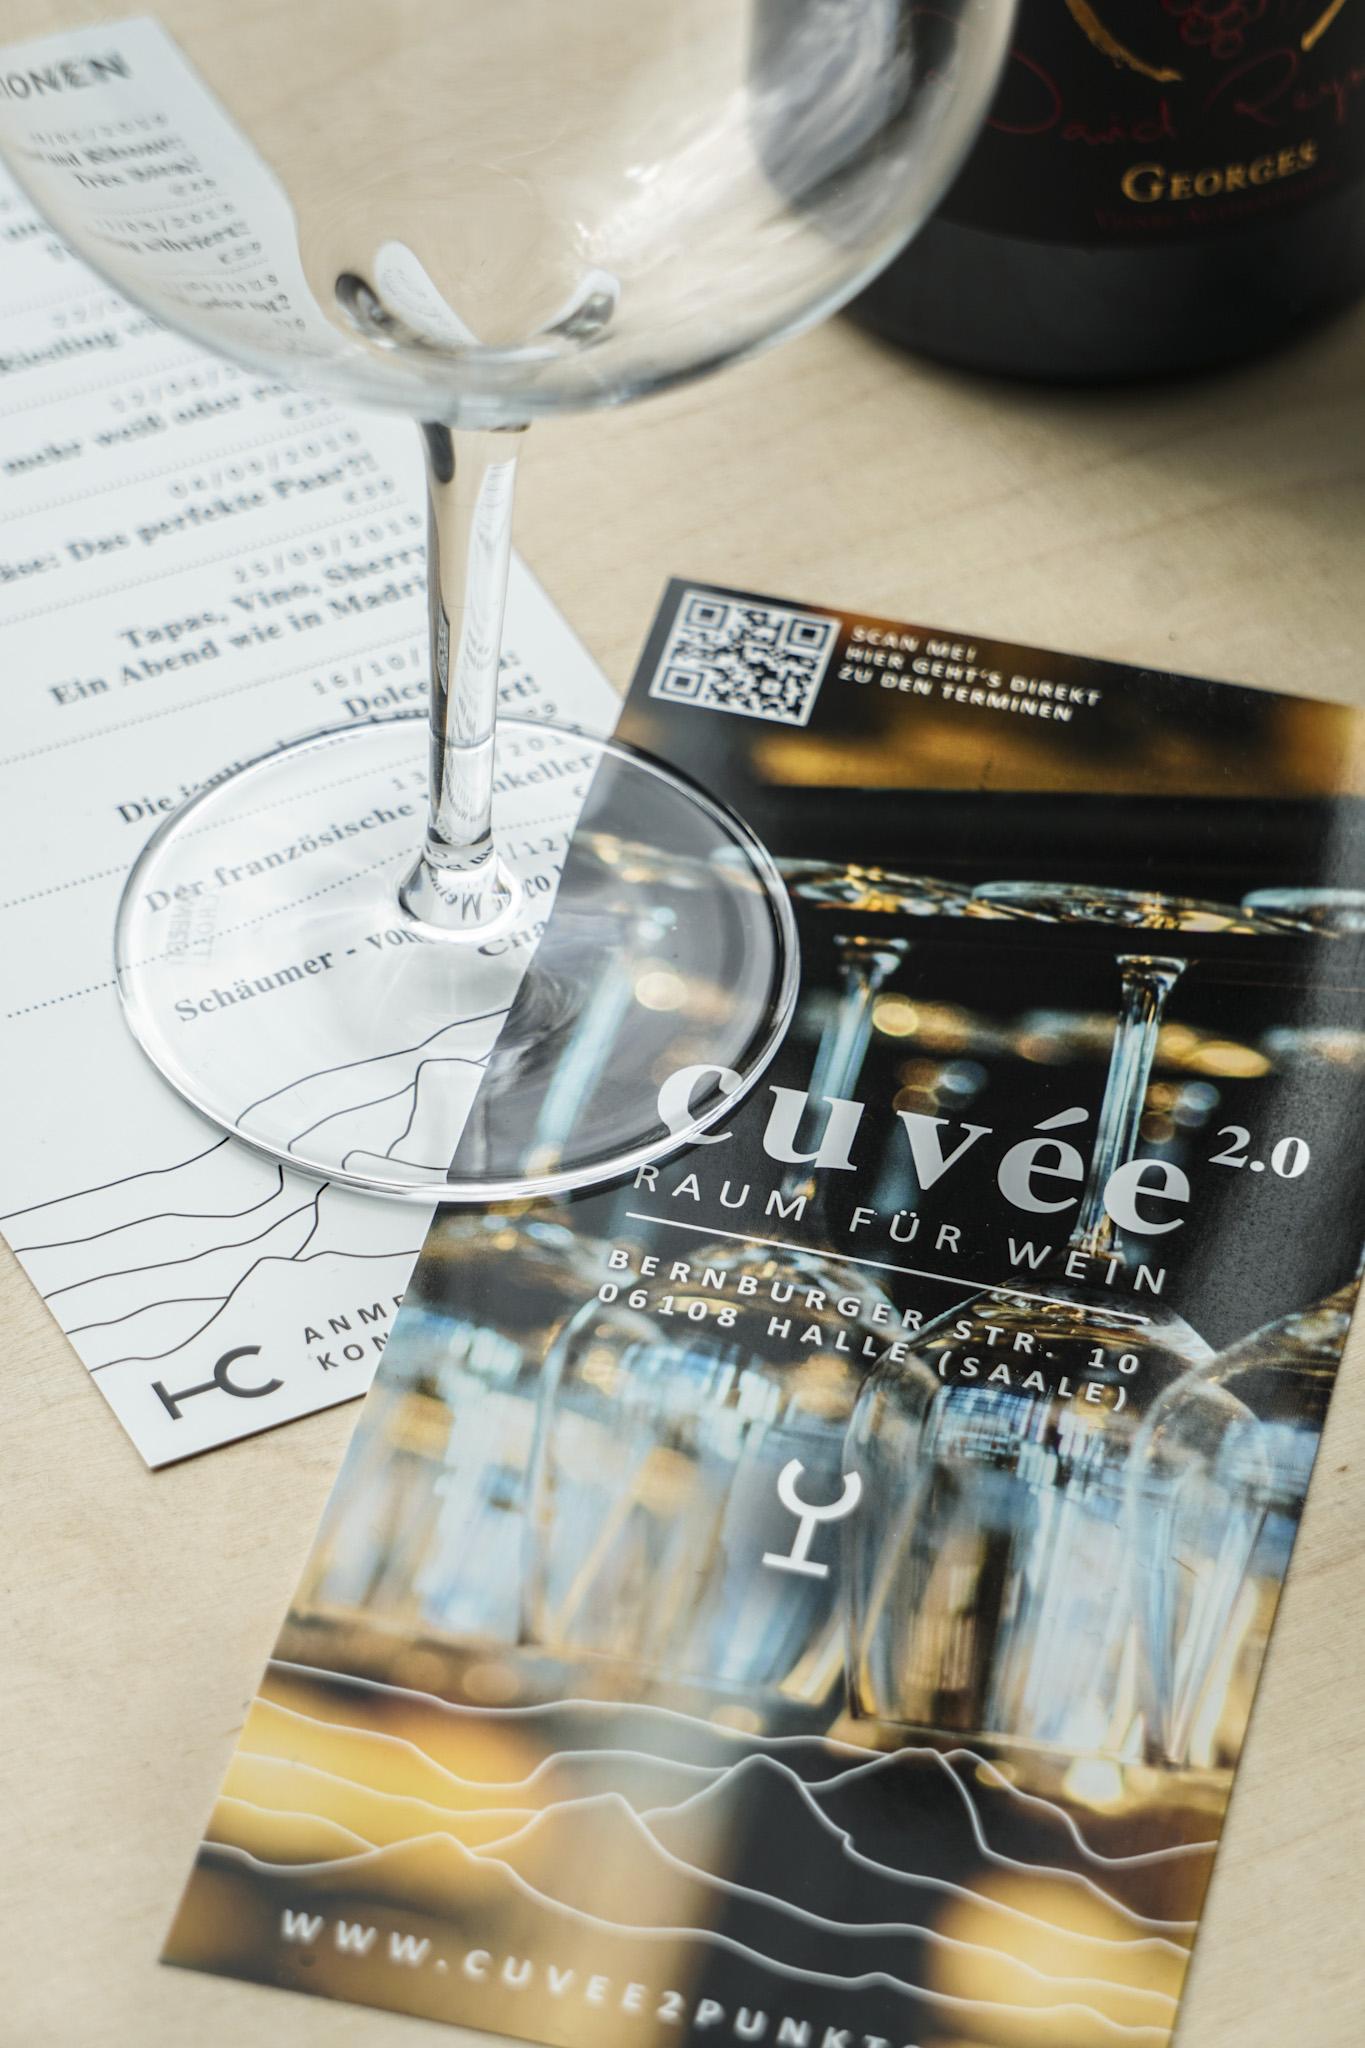 Cuvée-Flyer-Degustationen 4